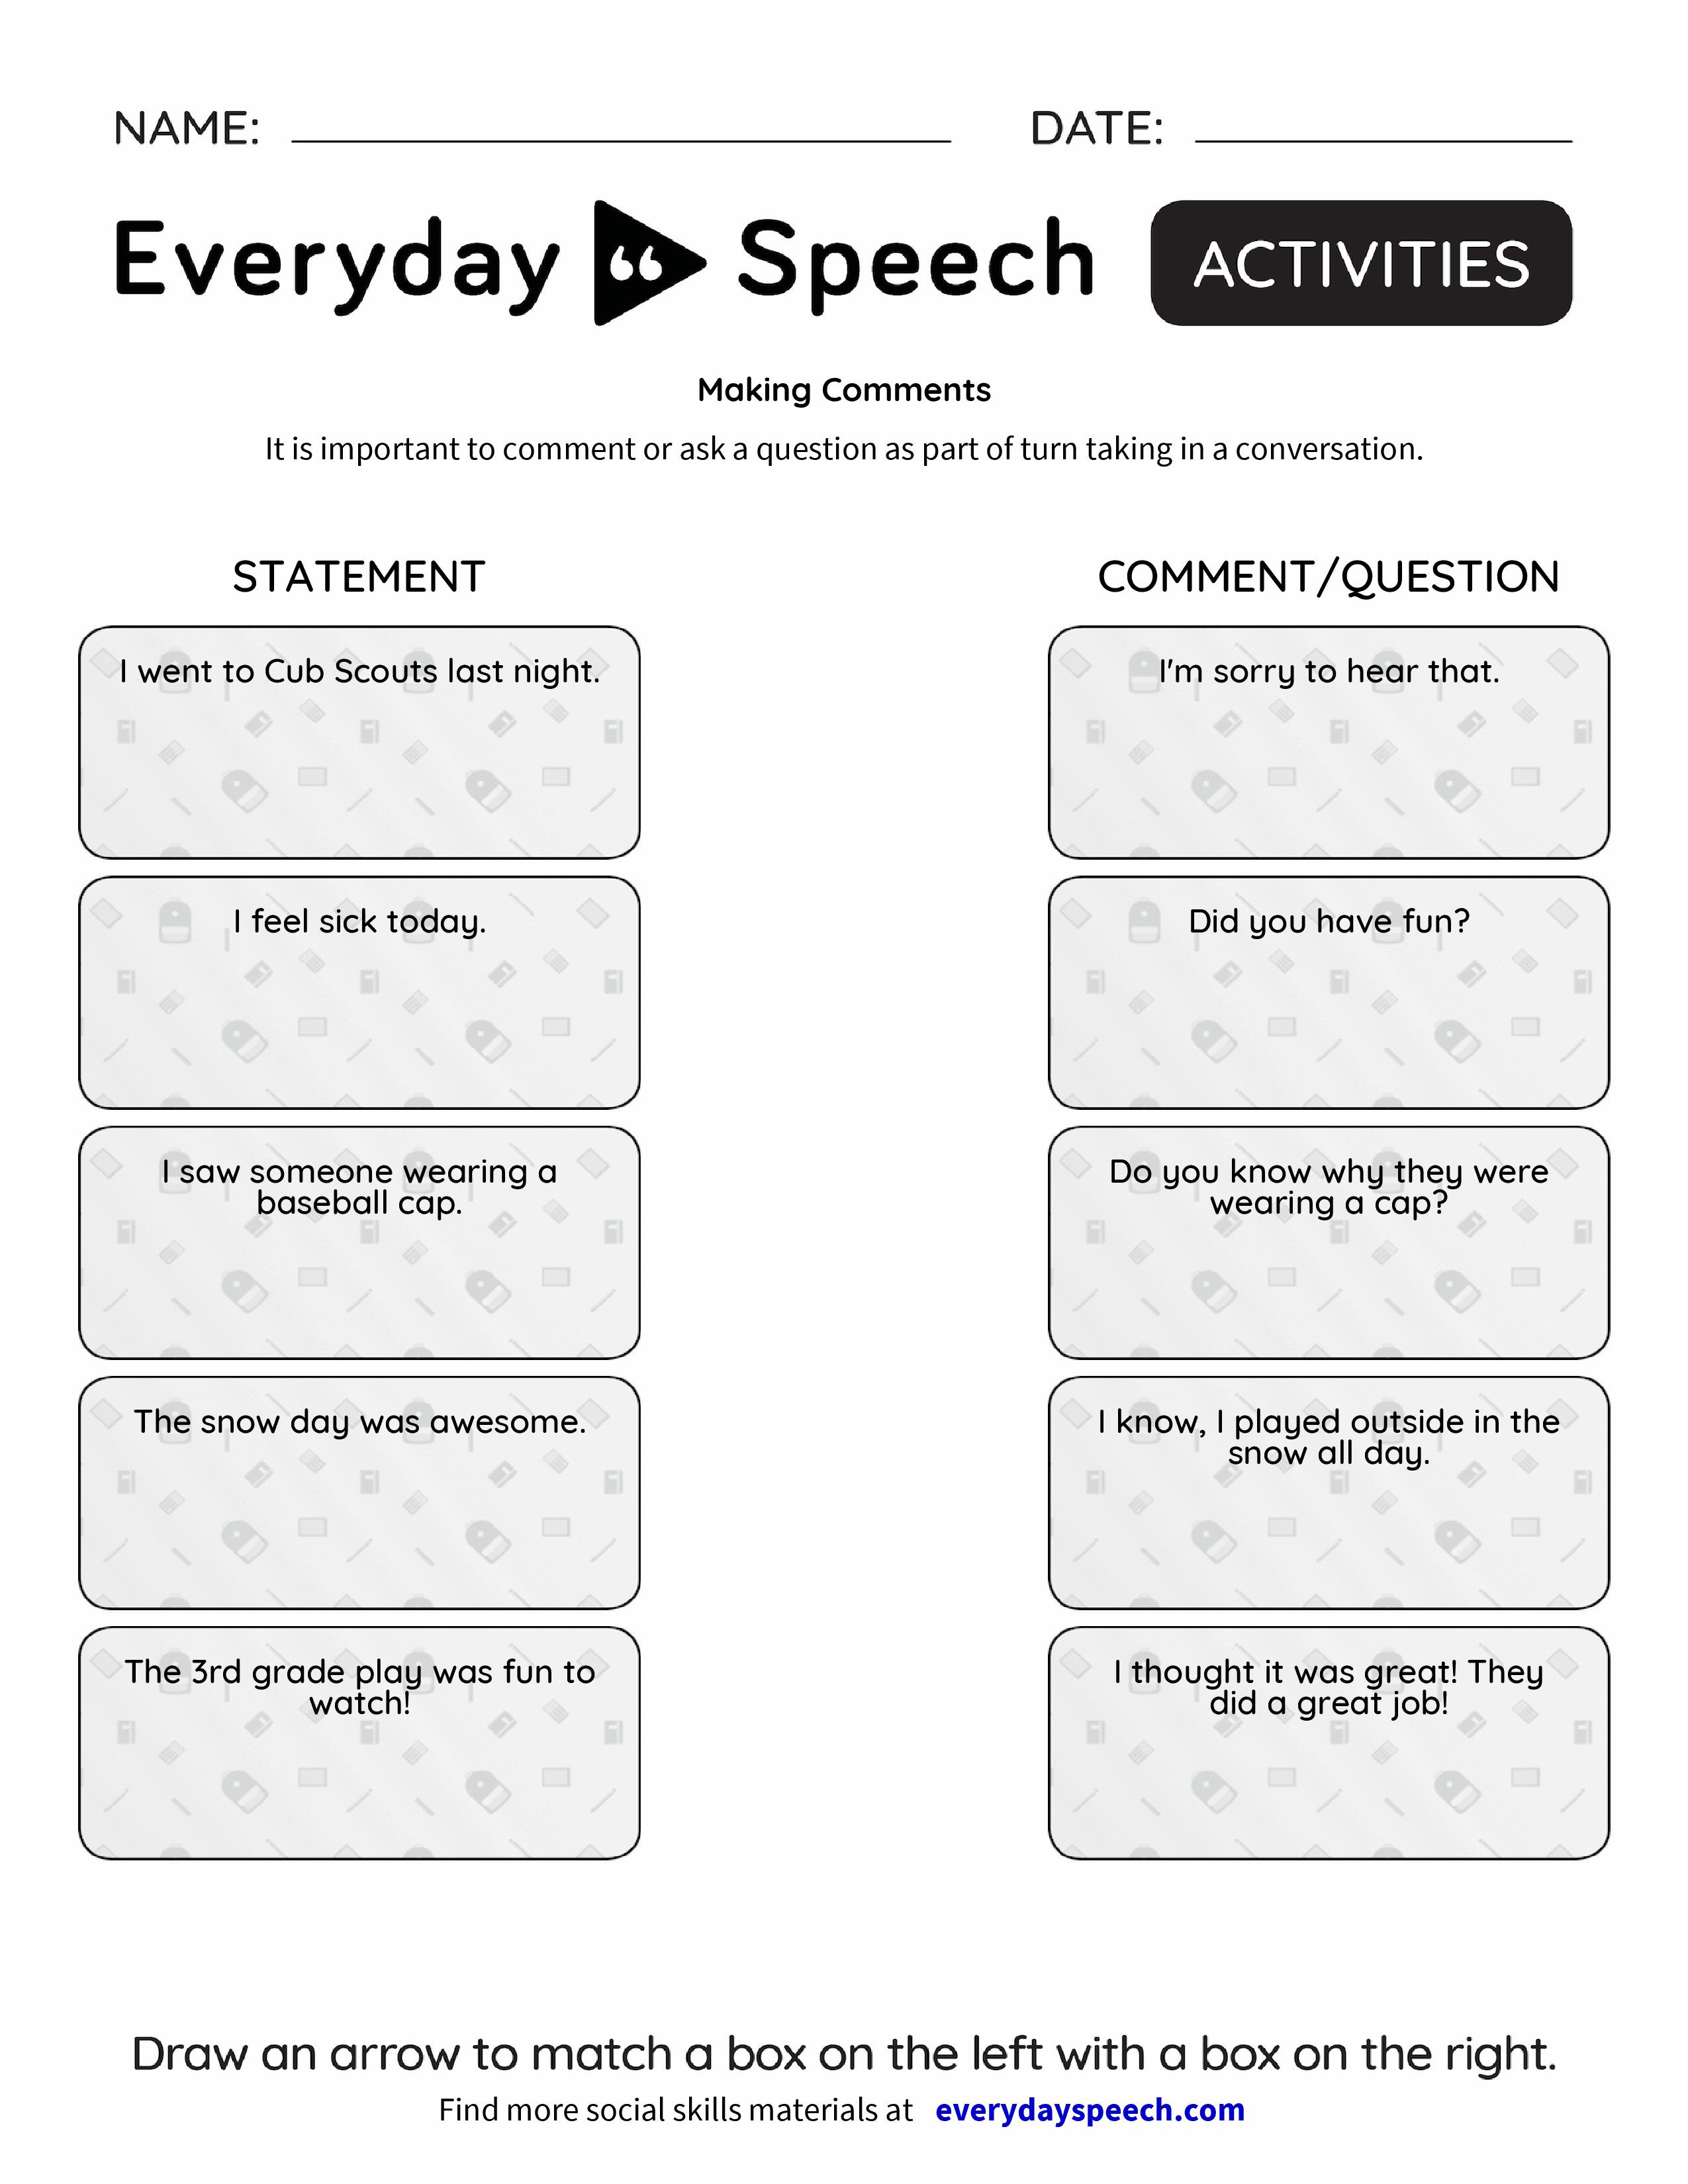 Making Comments Everyday Speech Everyday Speech